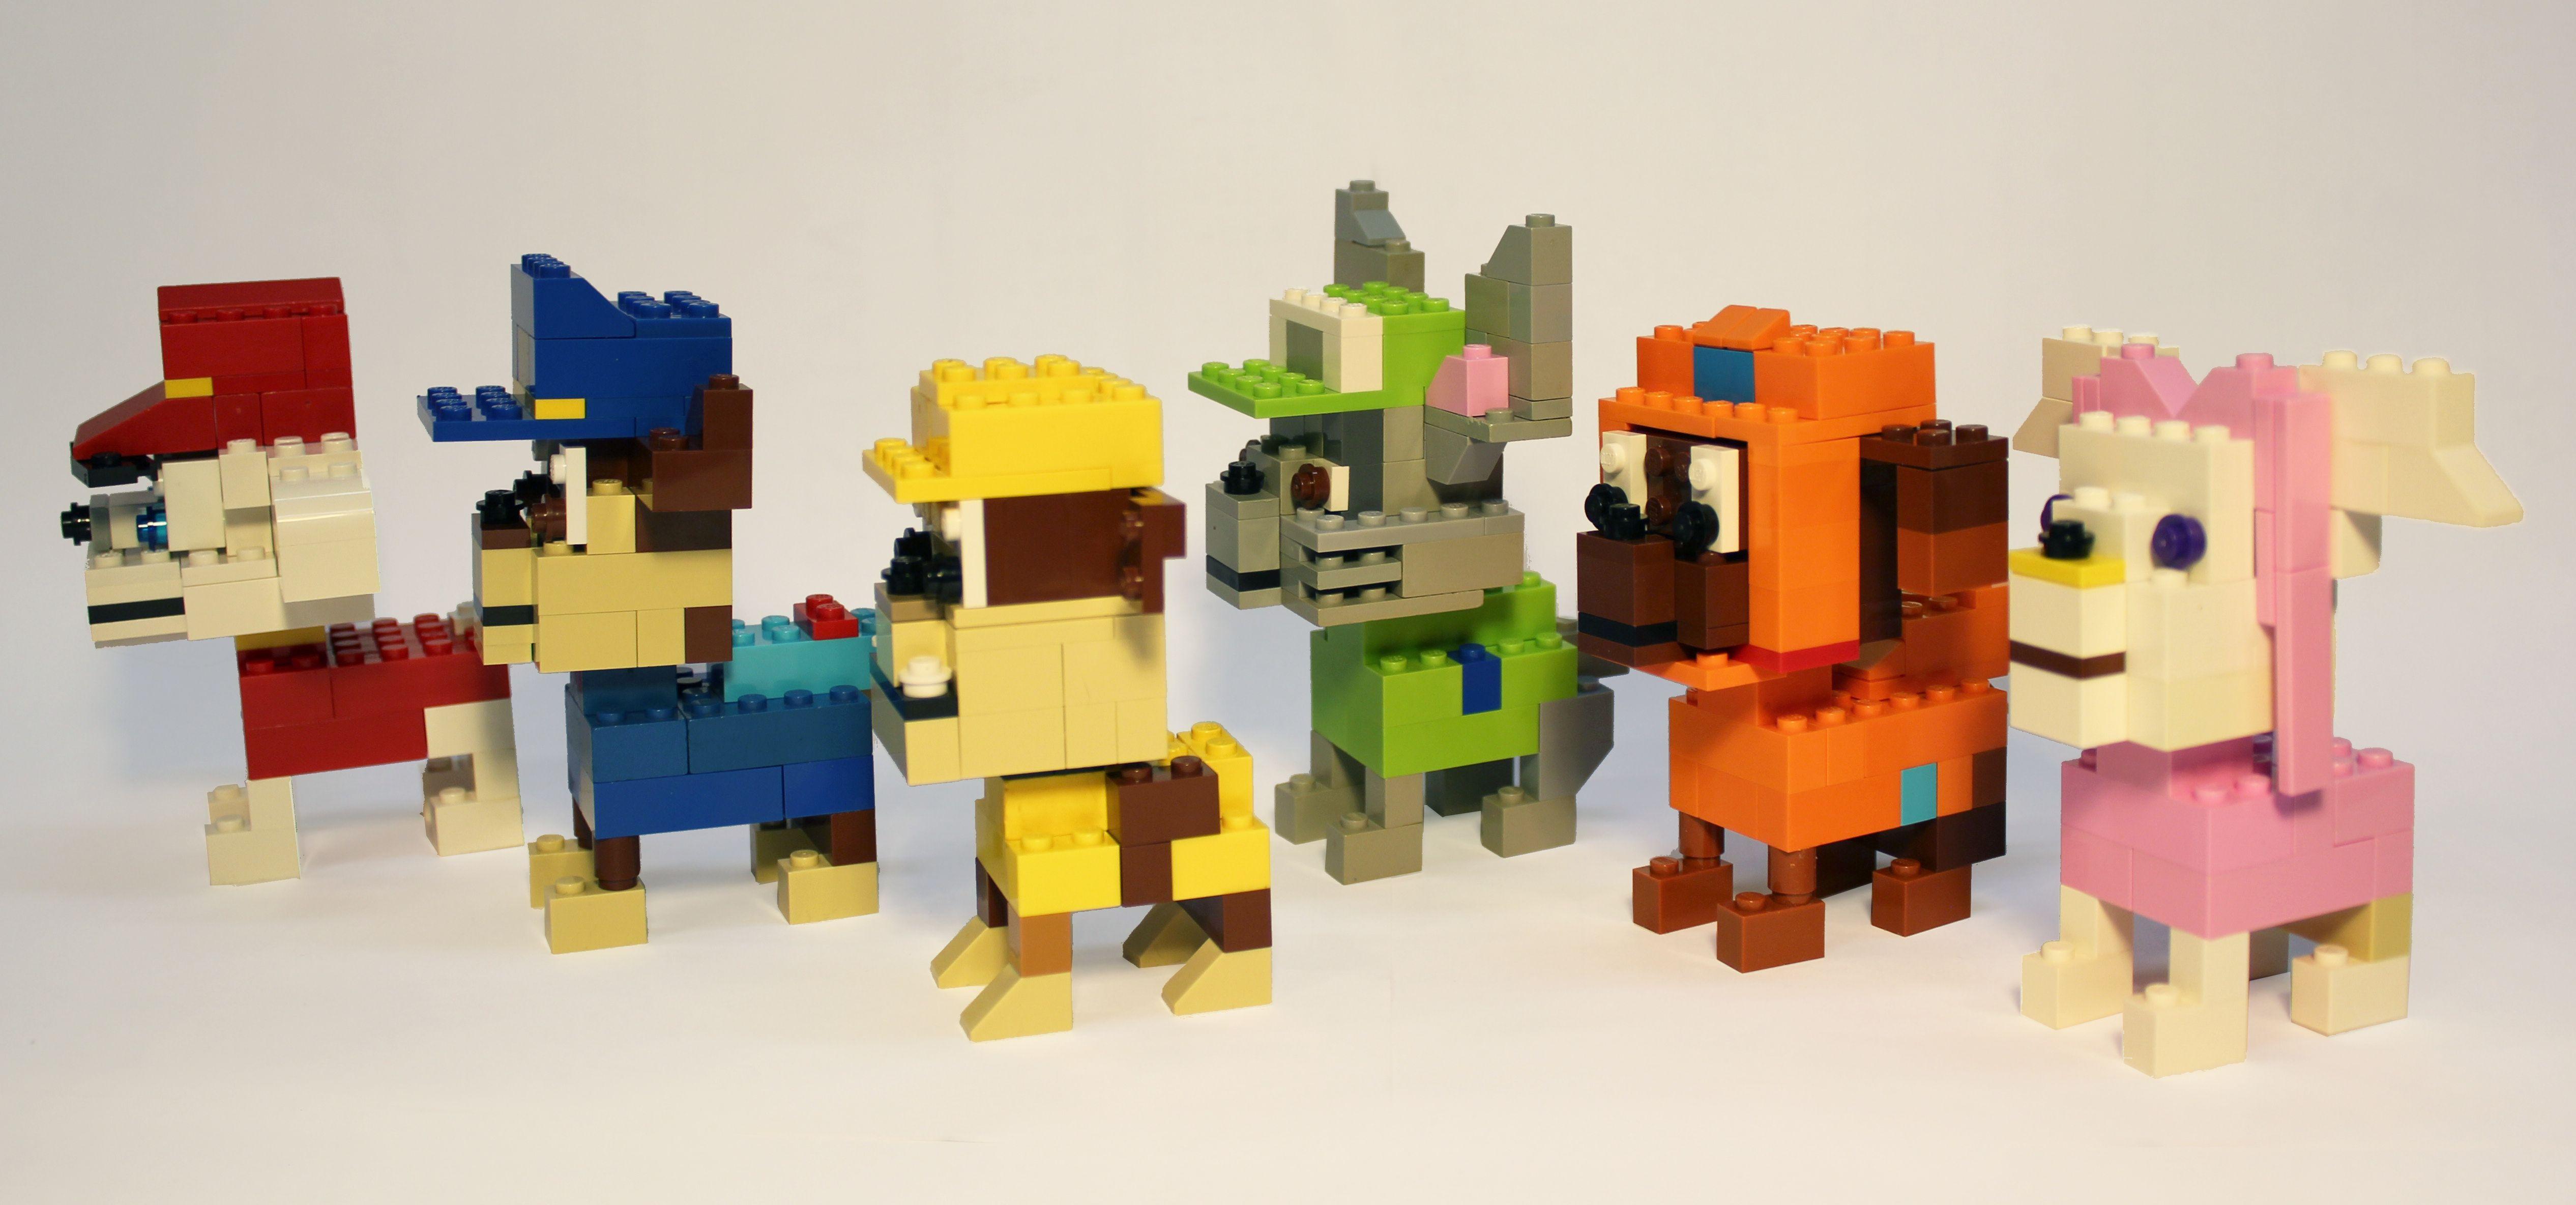 lego paw patrol | mamas legokram | pinterest | lego ideen, kinder